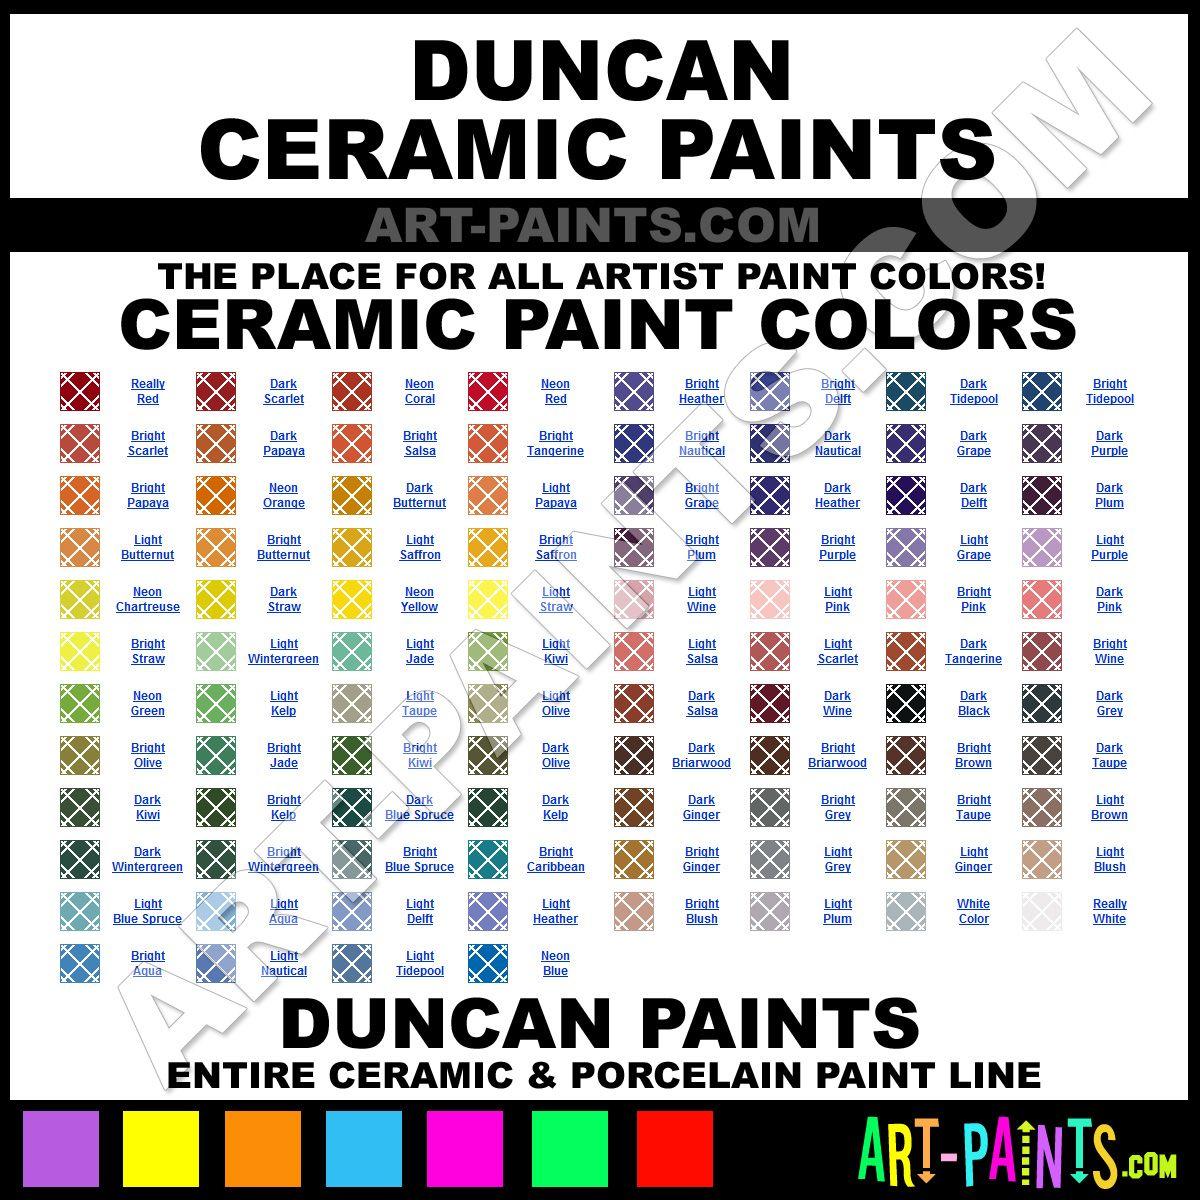 Folk art color chart acrylic paint - Liquitex Heavy Body Acrylic Paint Colors Liquitex Heavy Body Paint Colors Heavy Body Color Heavy Body Acrylics Liquitex Heavy Body Paint Line